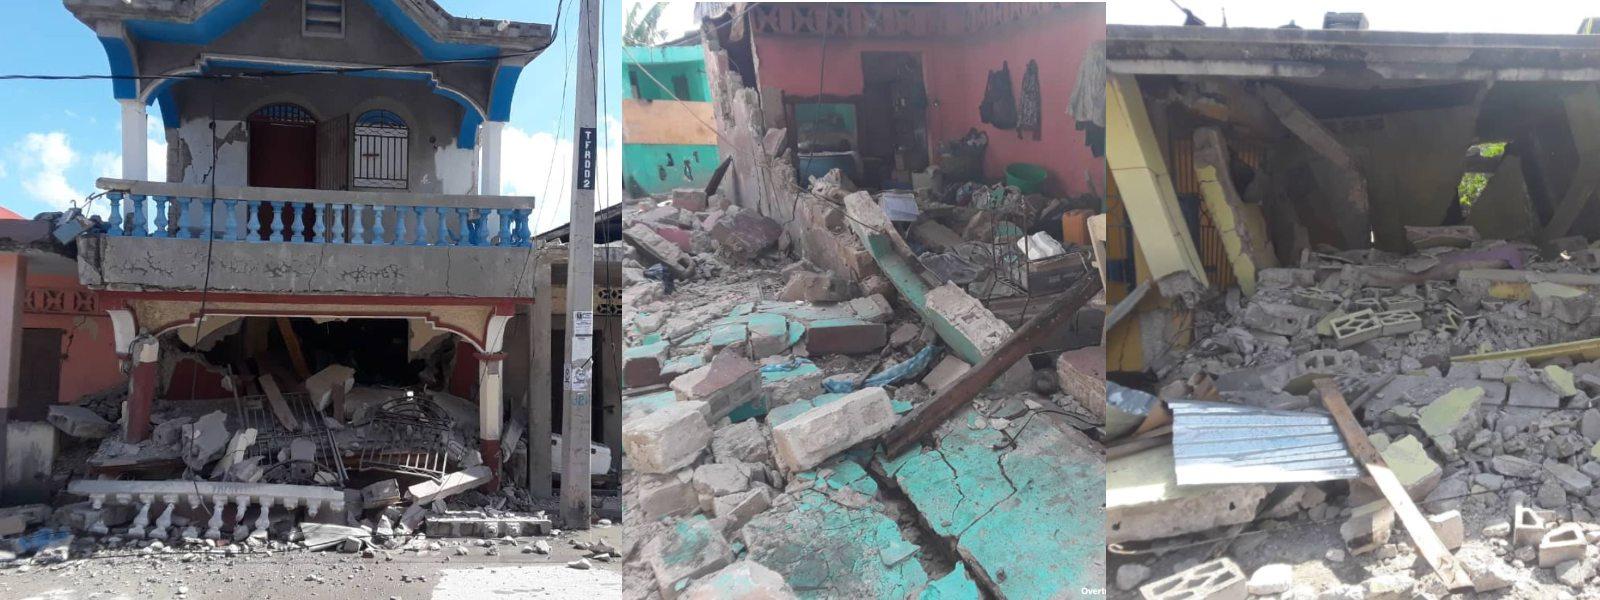 304 Dead After A 7.2 Magnitude Earthquake Hits Haiti